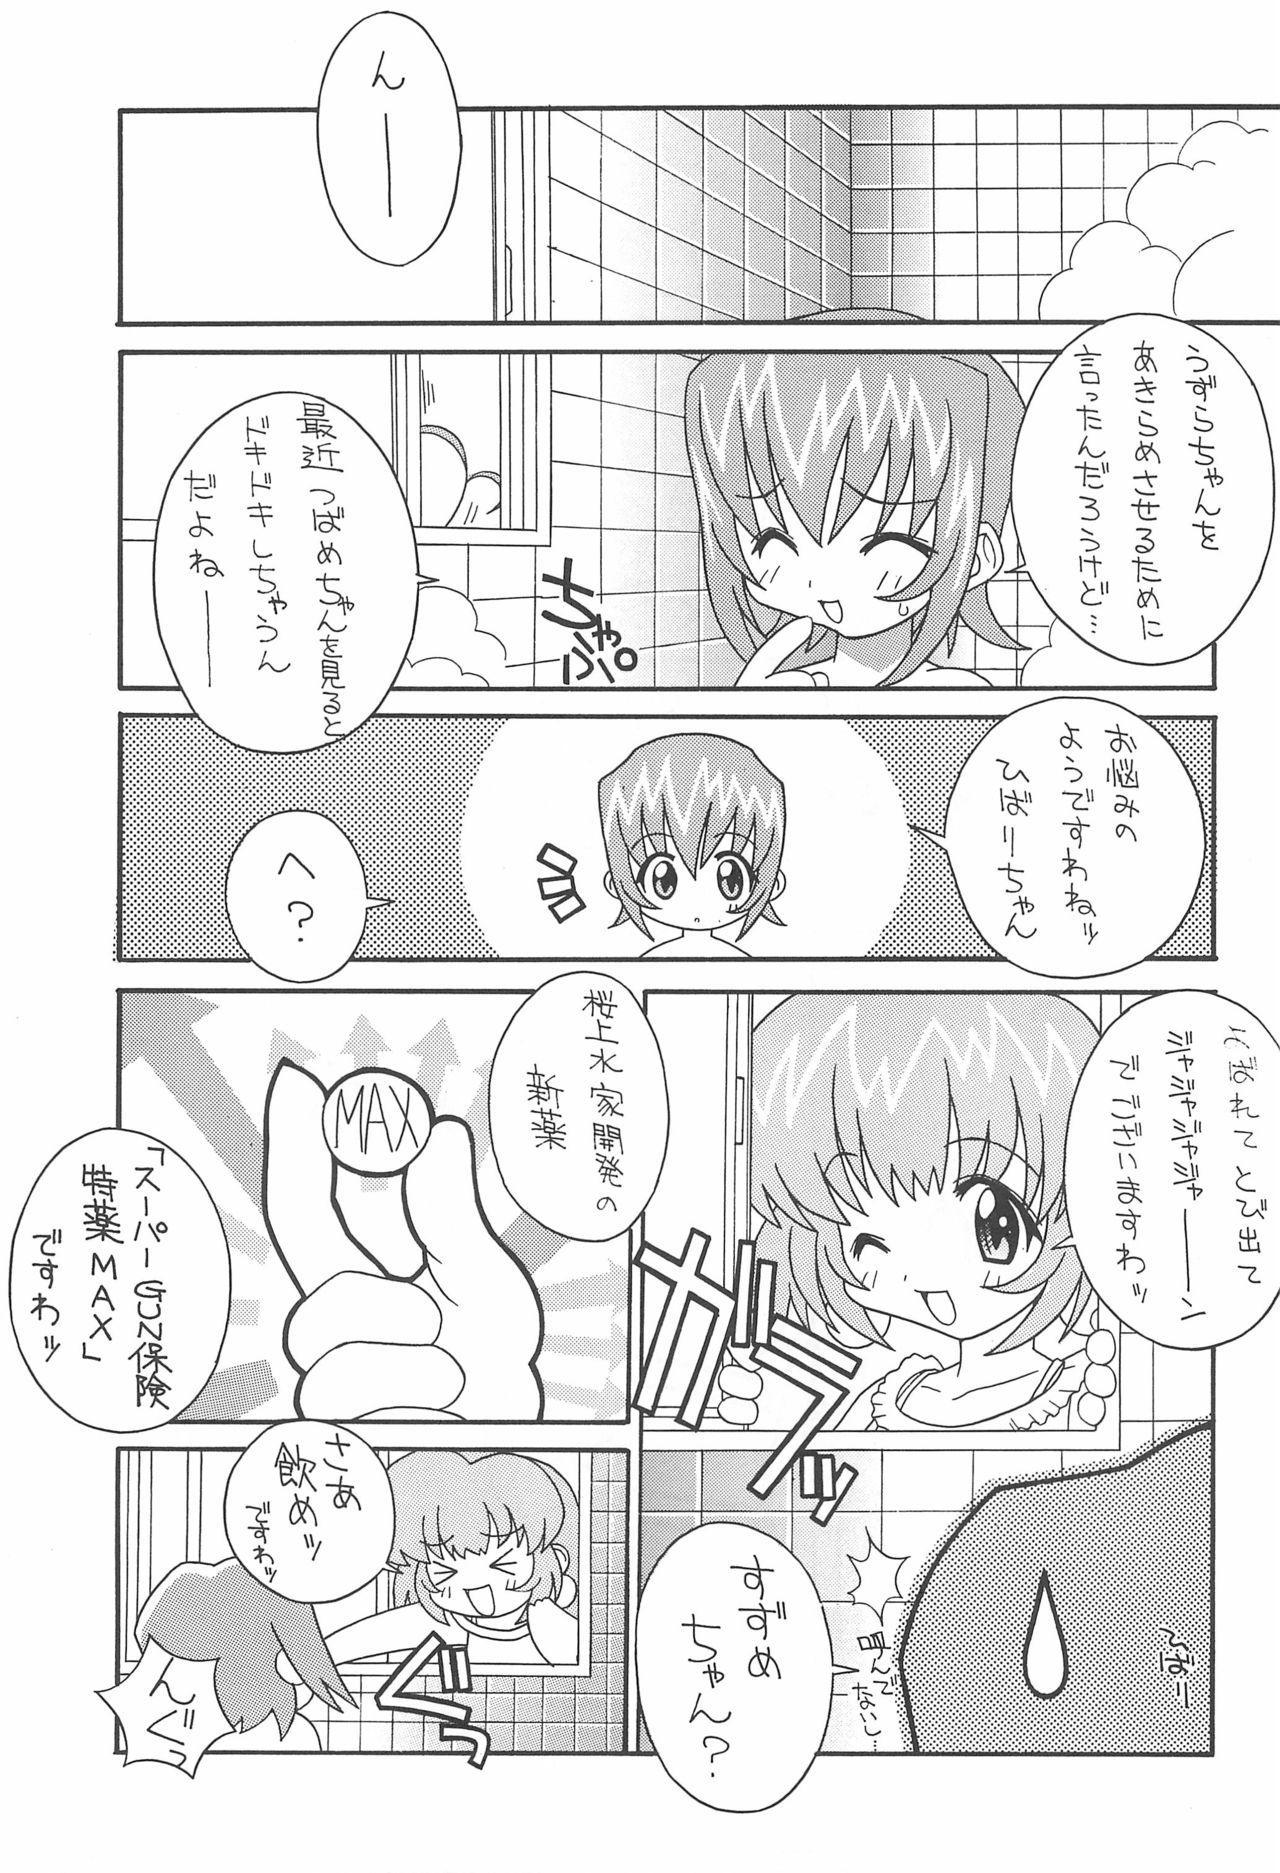 Soko da! Ninpou Youji Taikei no Jutsu 2nd 14